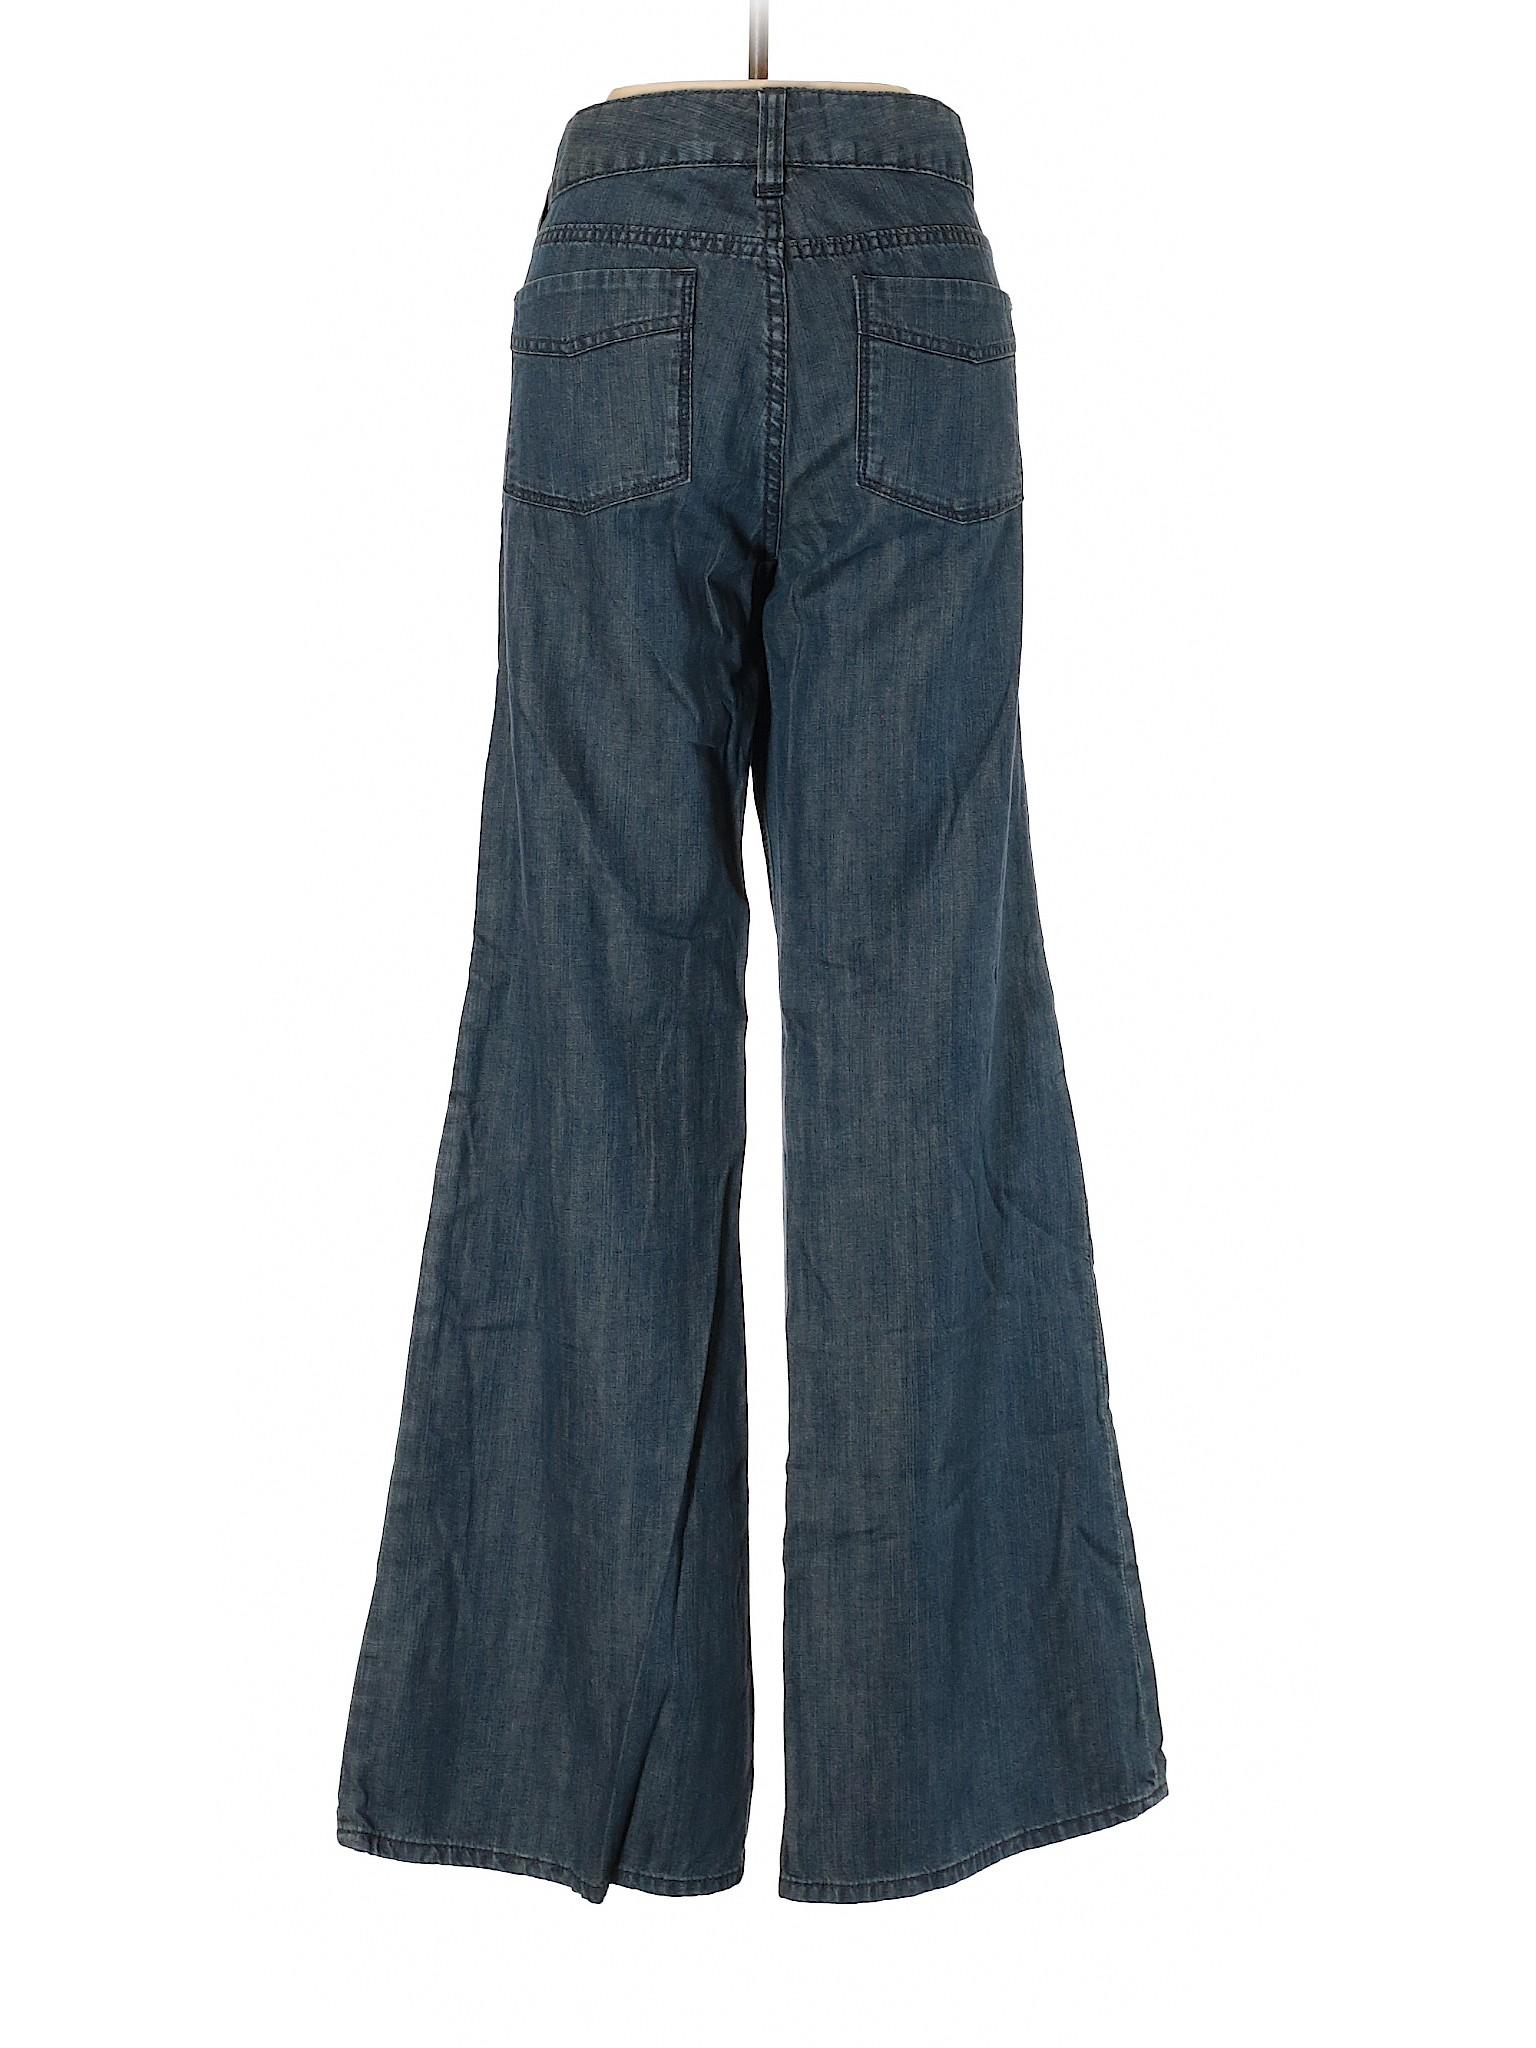 Promotion Gas Jeans Promotion Jeans Gas Jeans Gas Jeans Gas Promotion Promotion dqTwxdF